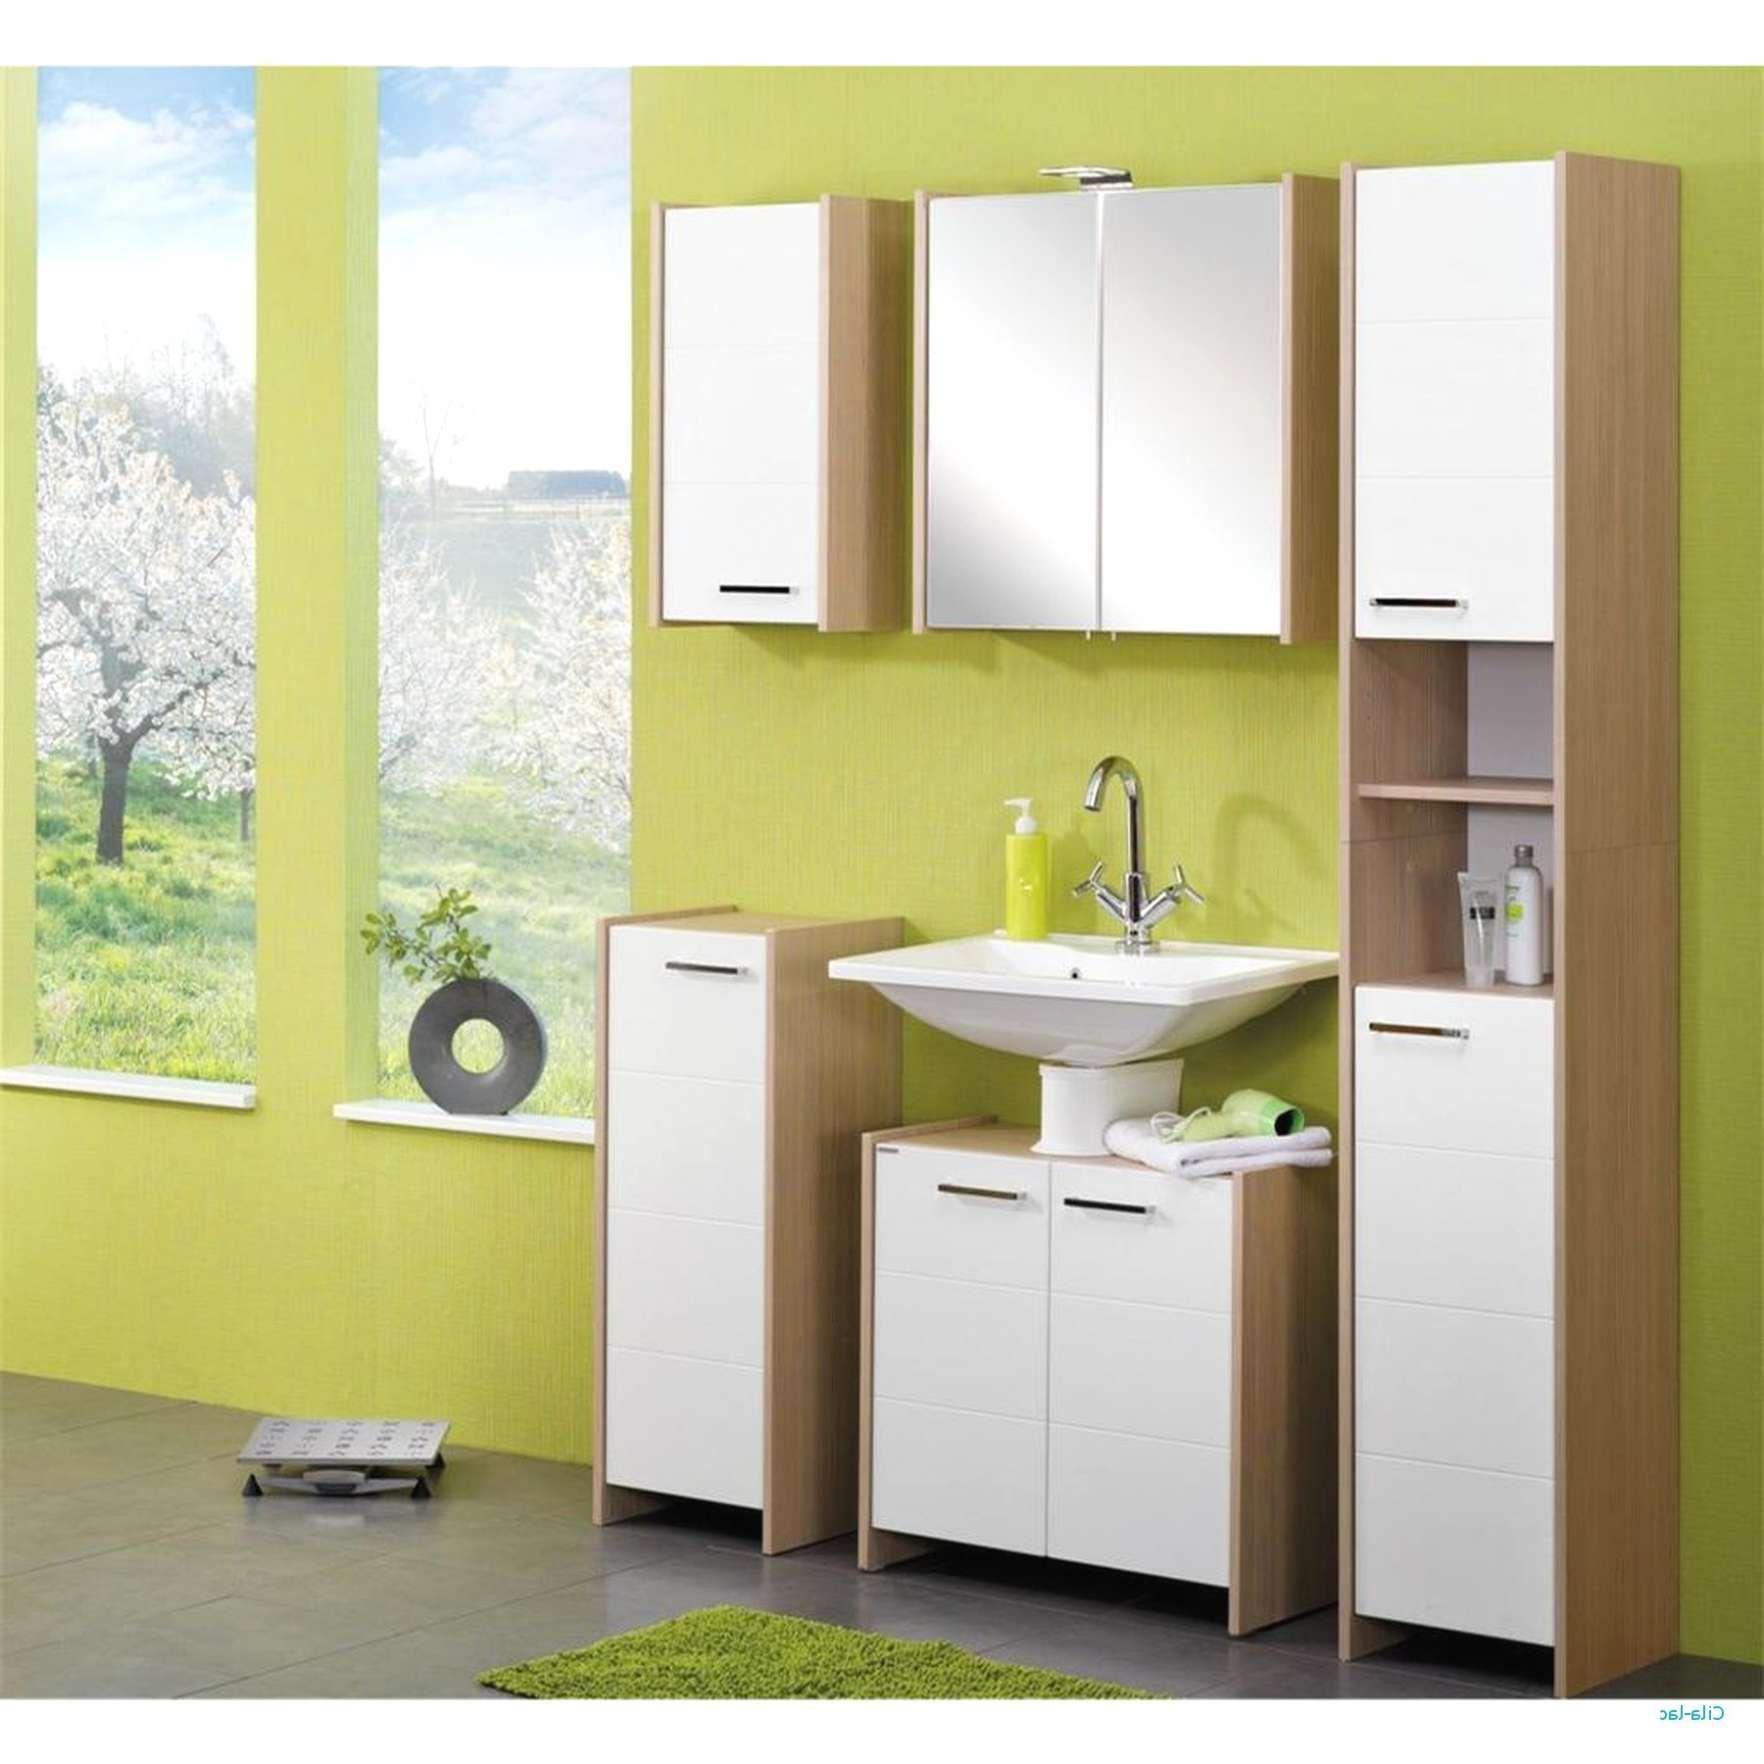 17 Wunderbar Fotografie Von Ikea Badezimmermobel